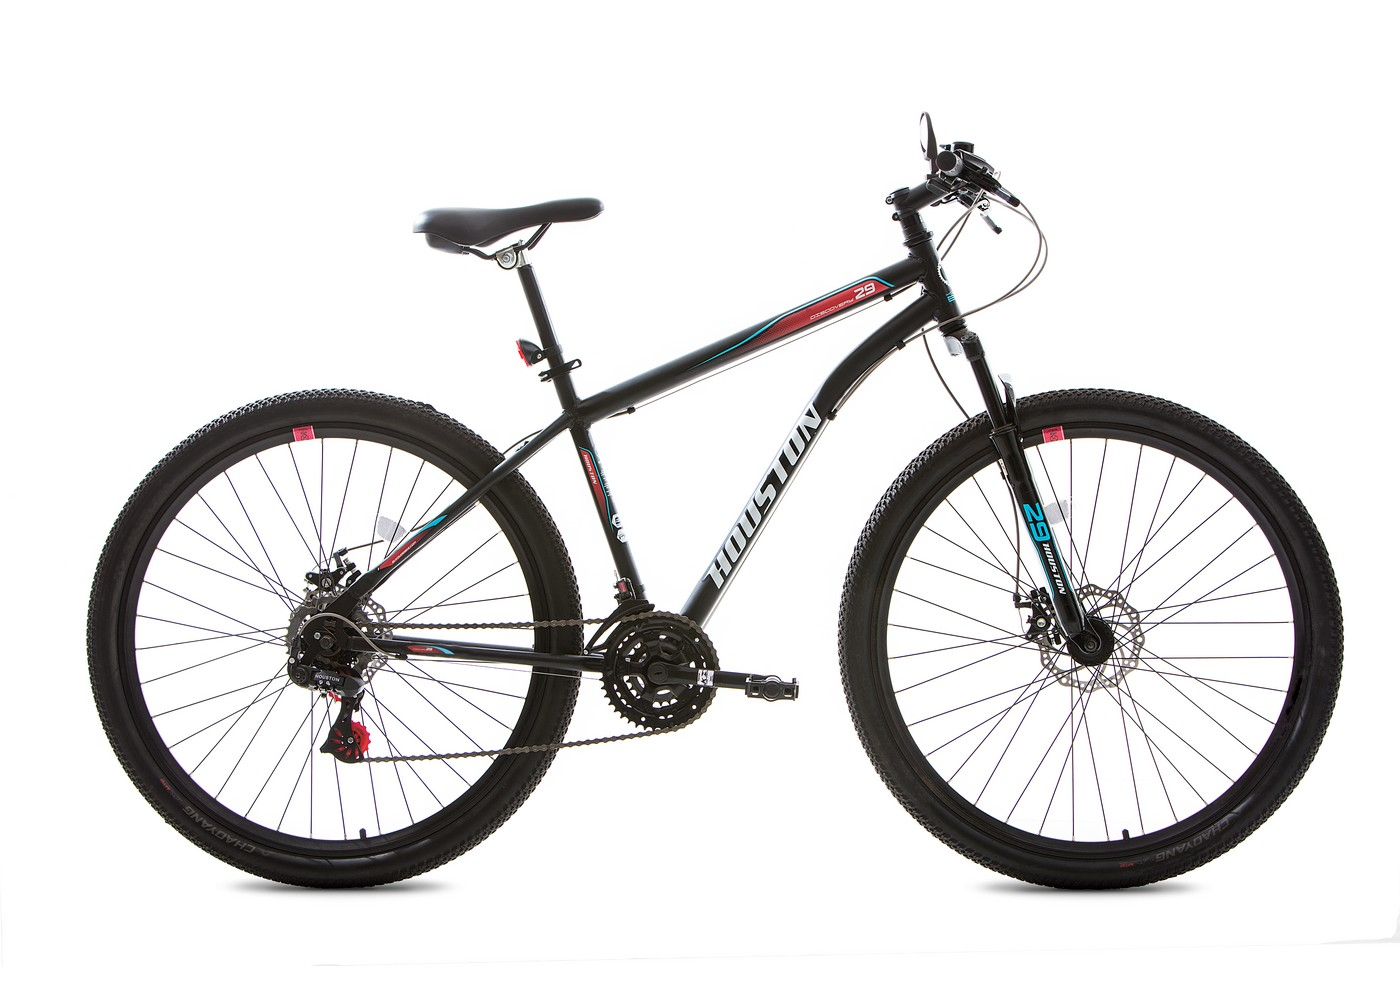 Bicicleta Houston Discovery 2.9, Tamanho 18